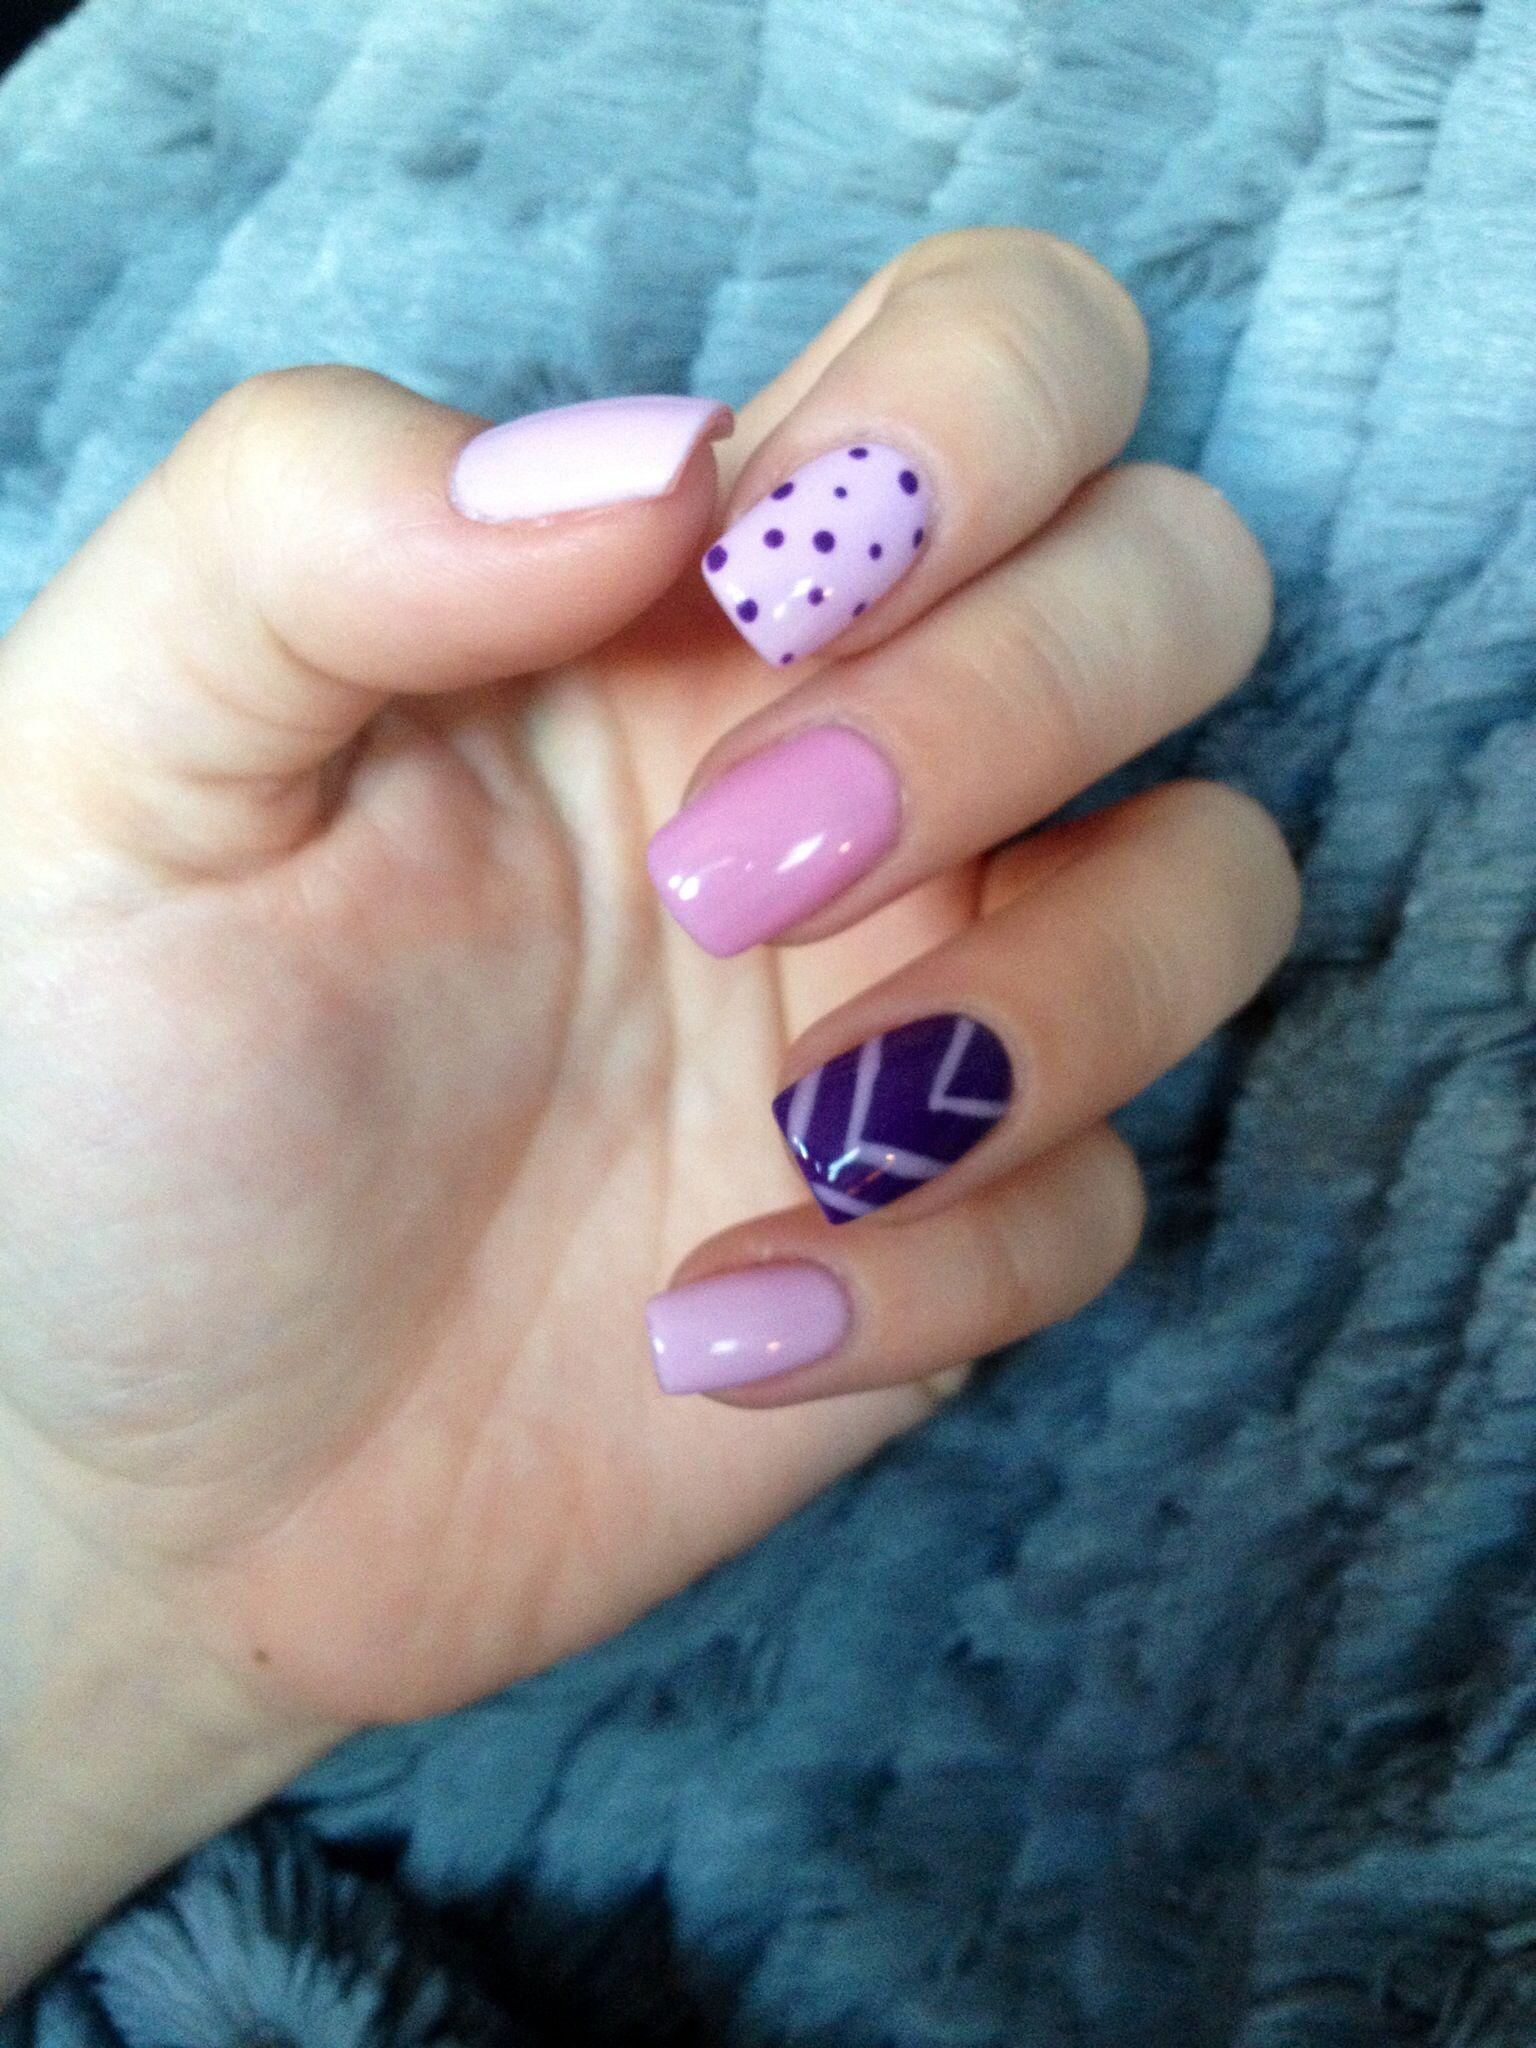 No-chip manicure | My nails II | Pinterest | Manicure, Pedi and Mani ...